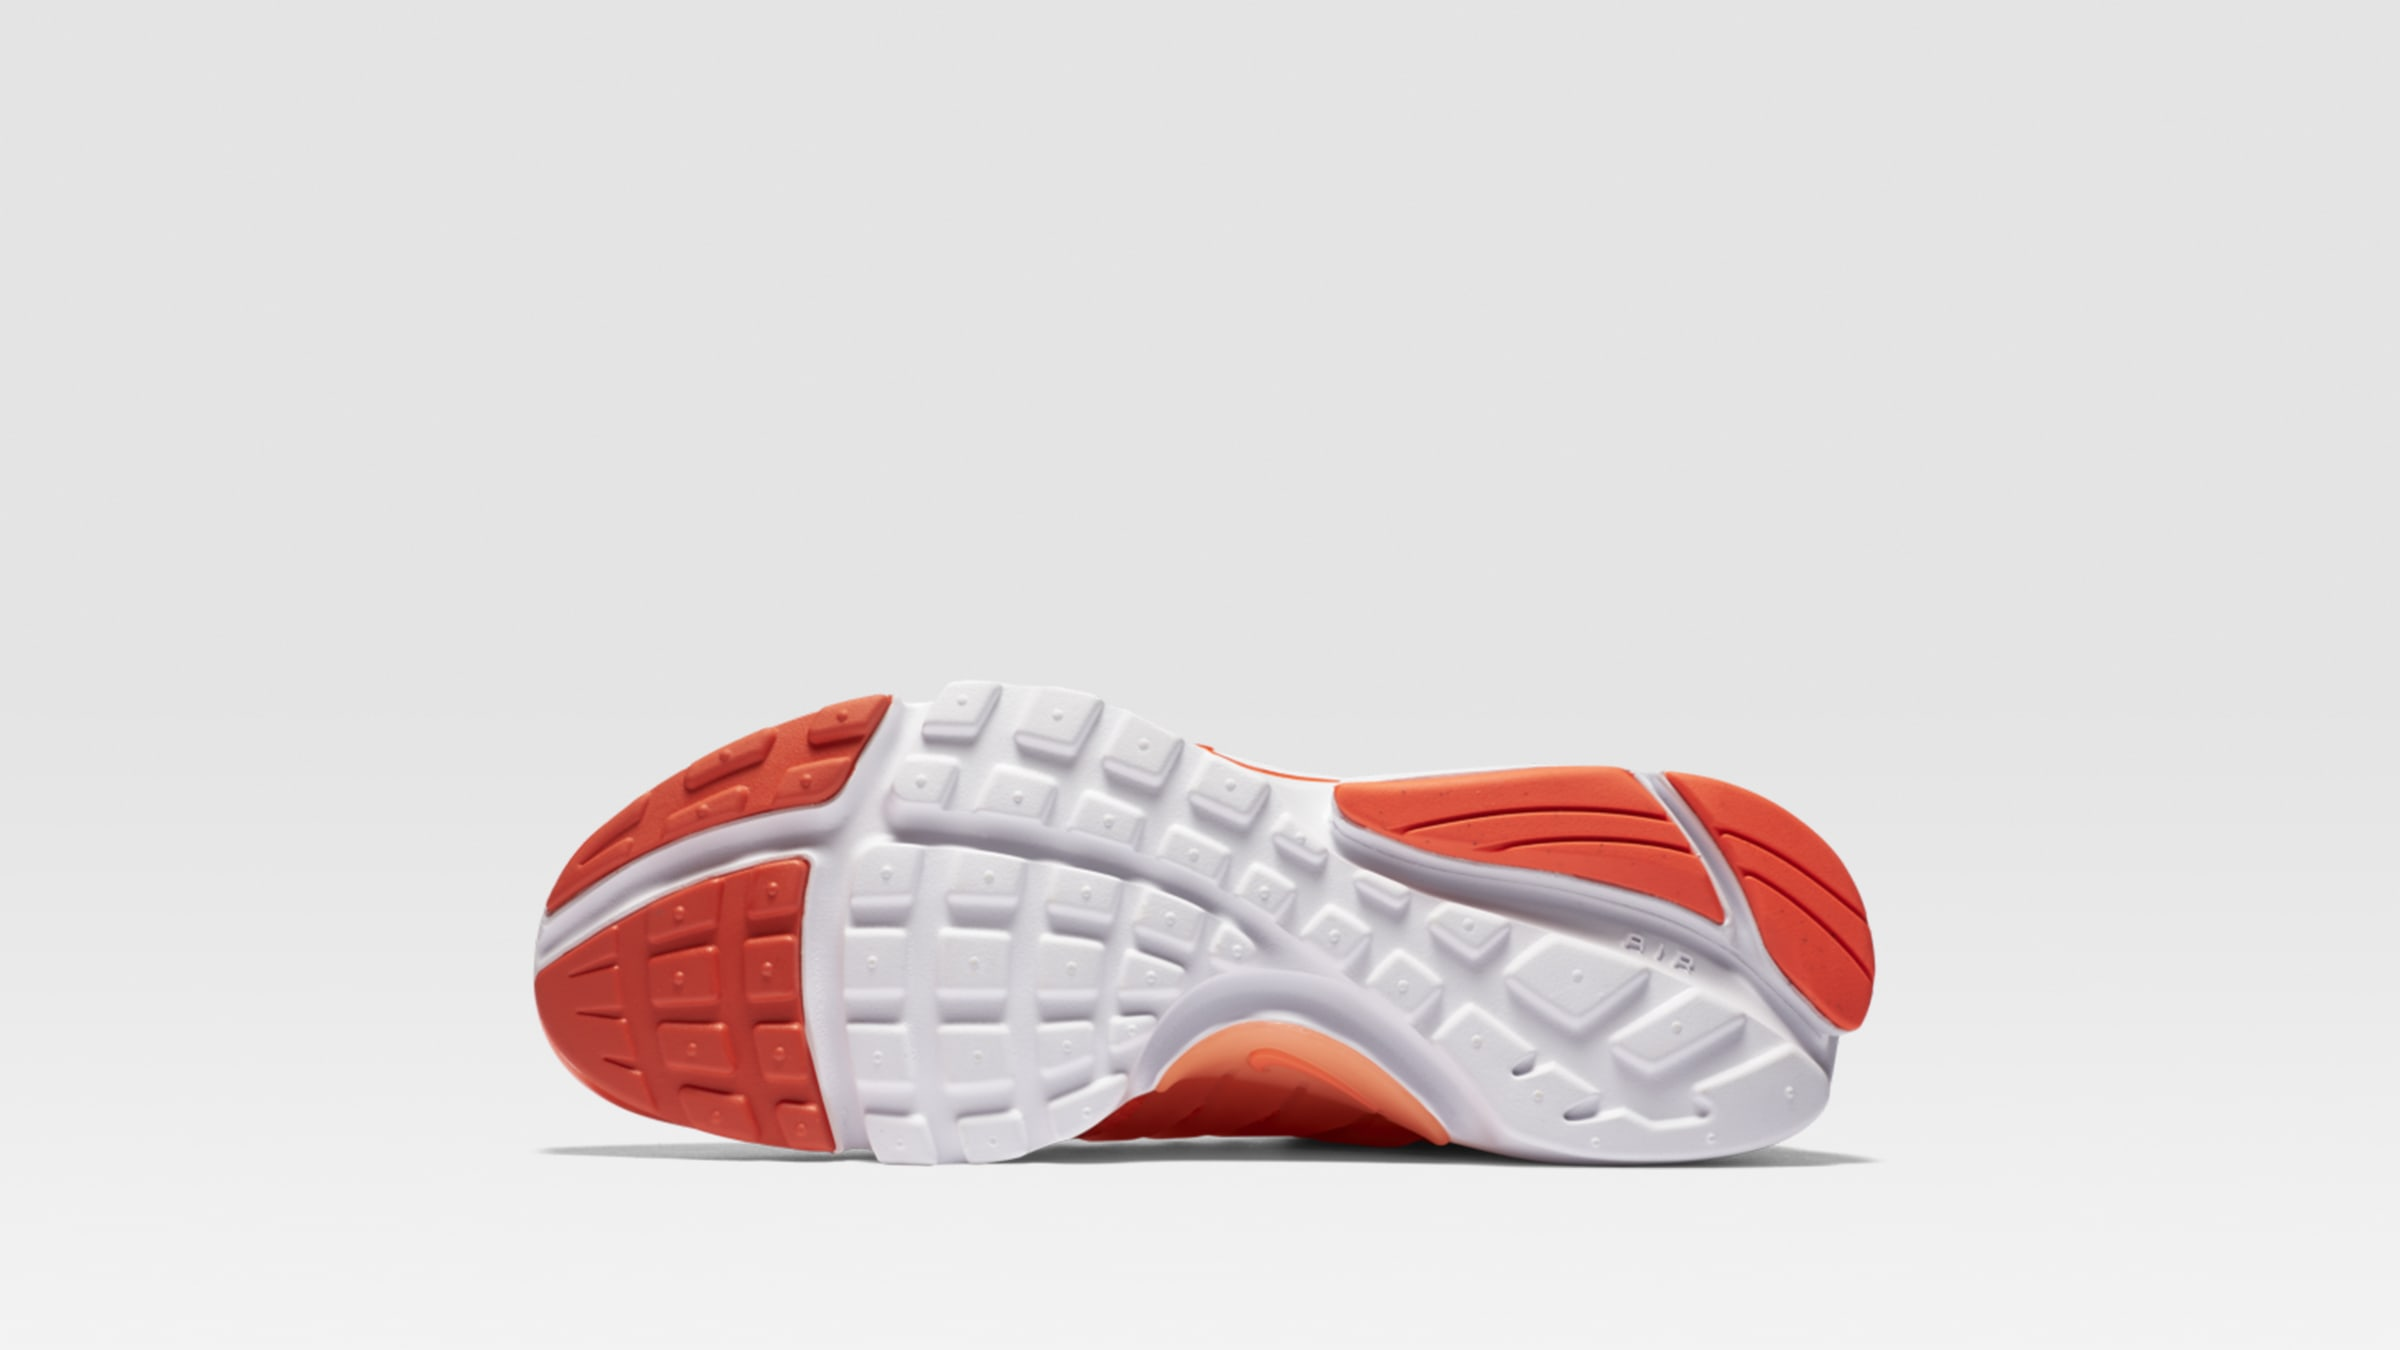 d256f2aa495 Nike Air Presto Ultra Flyknit Total Crimson   White